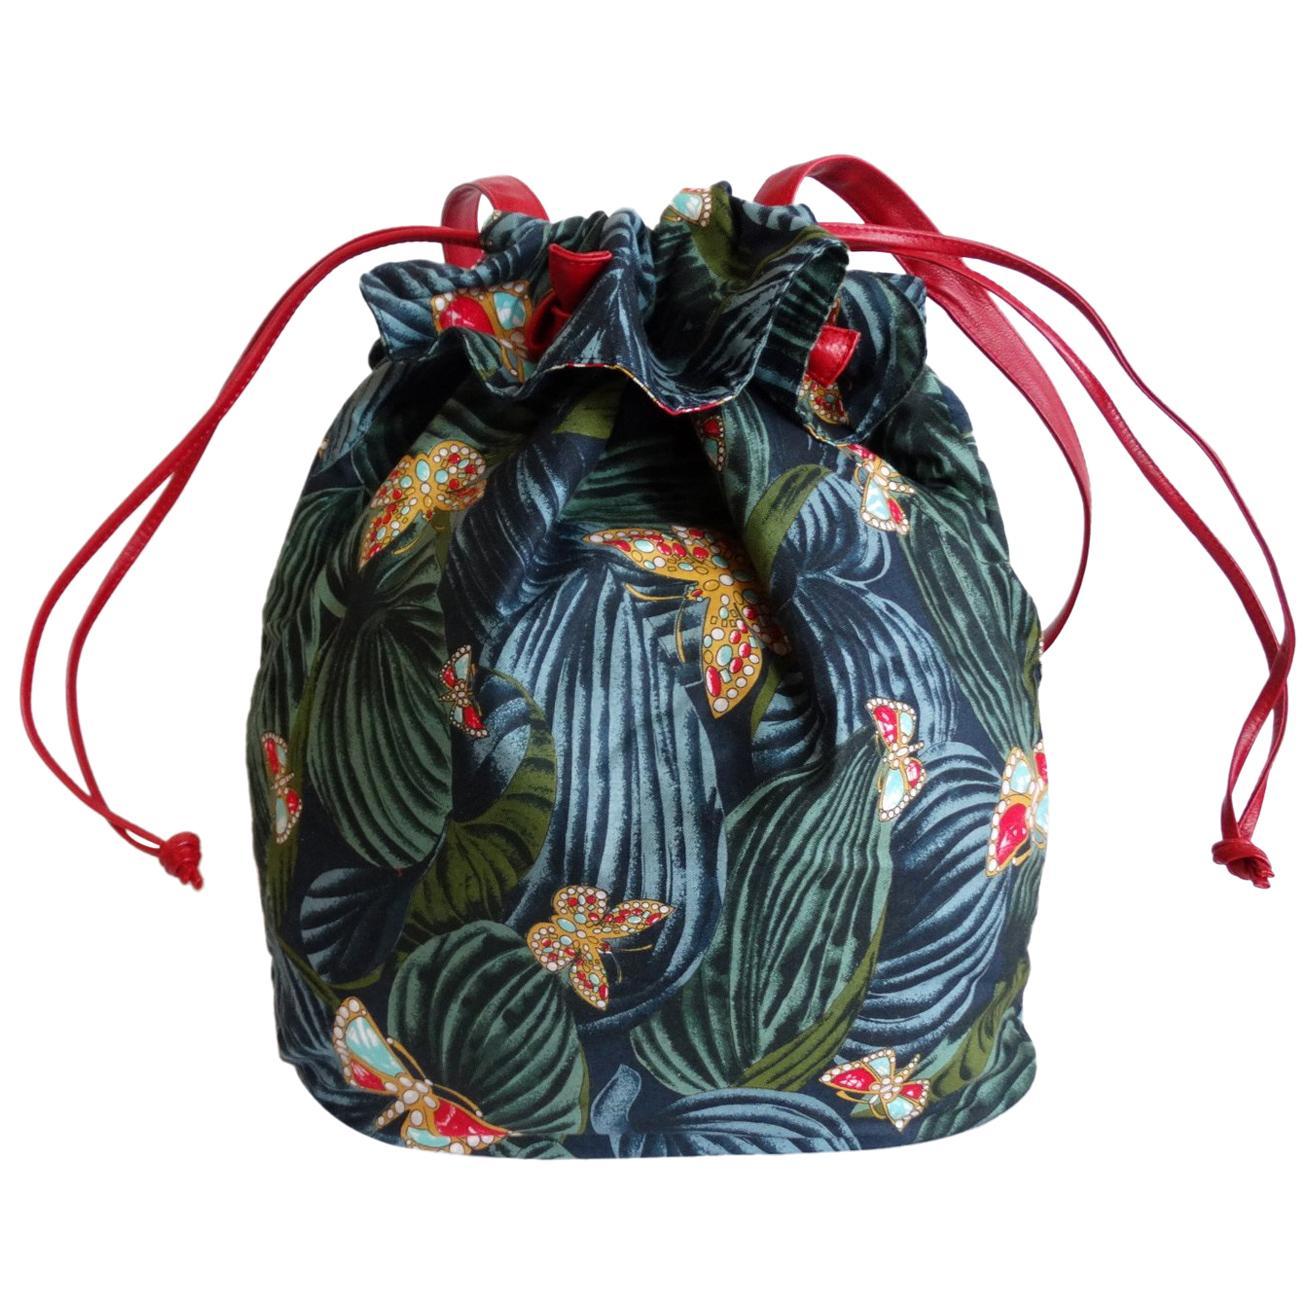 1970s Bottega Veneta Rainforest Bucket Bag